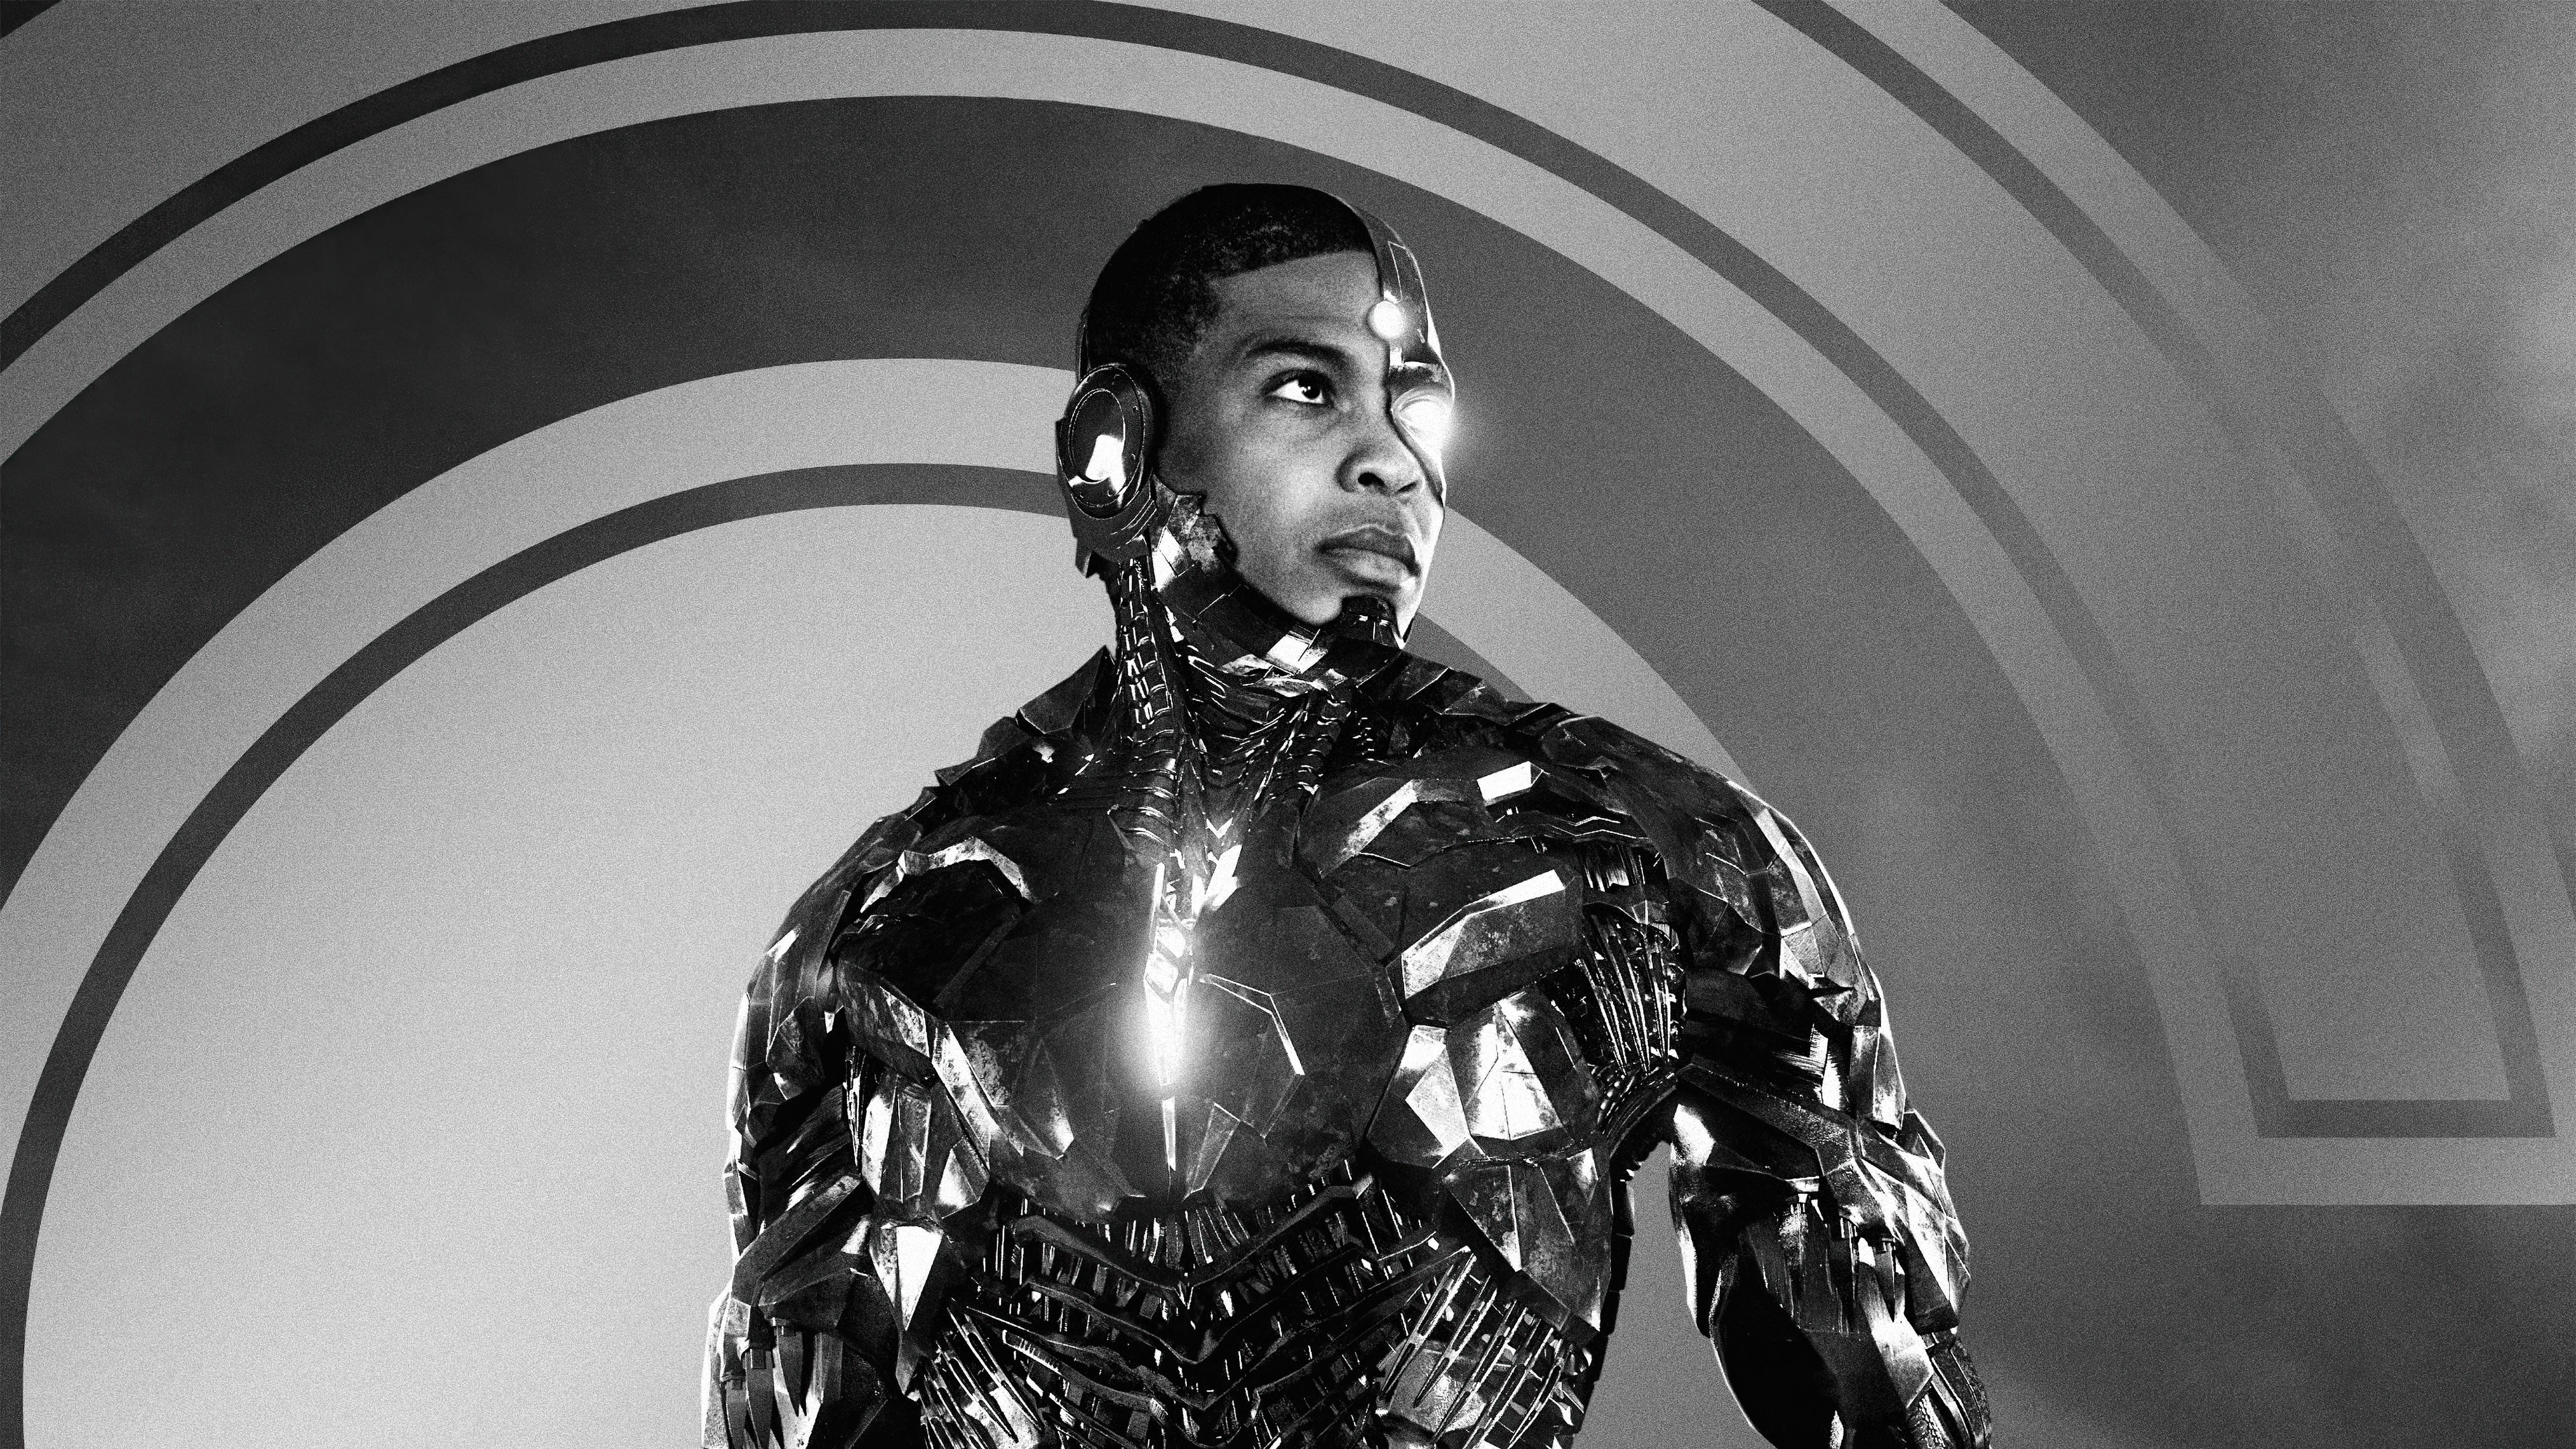 cyborg justice league zack synders cut 4k 1617449288 - Cyborg Justice League Zack Synders Cut 4k - Cyborg Justice League Zack Synders Cut 4k wallpapers